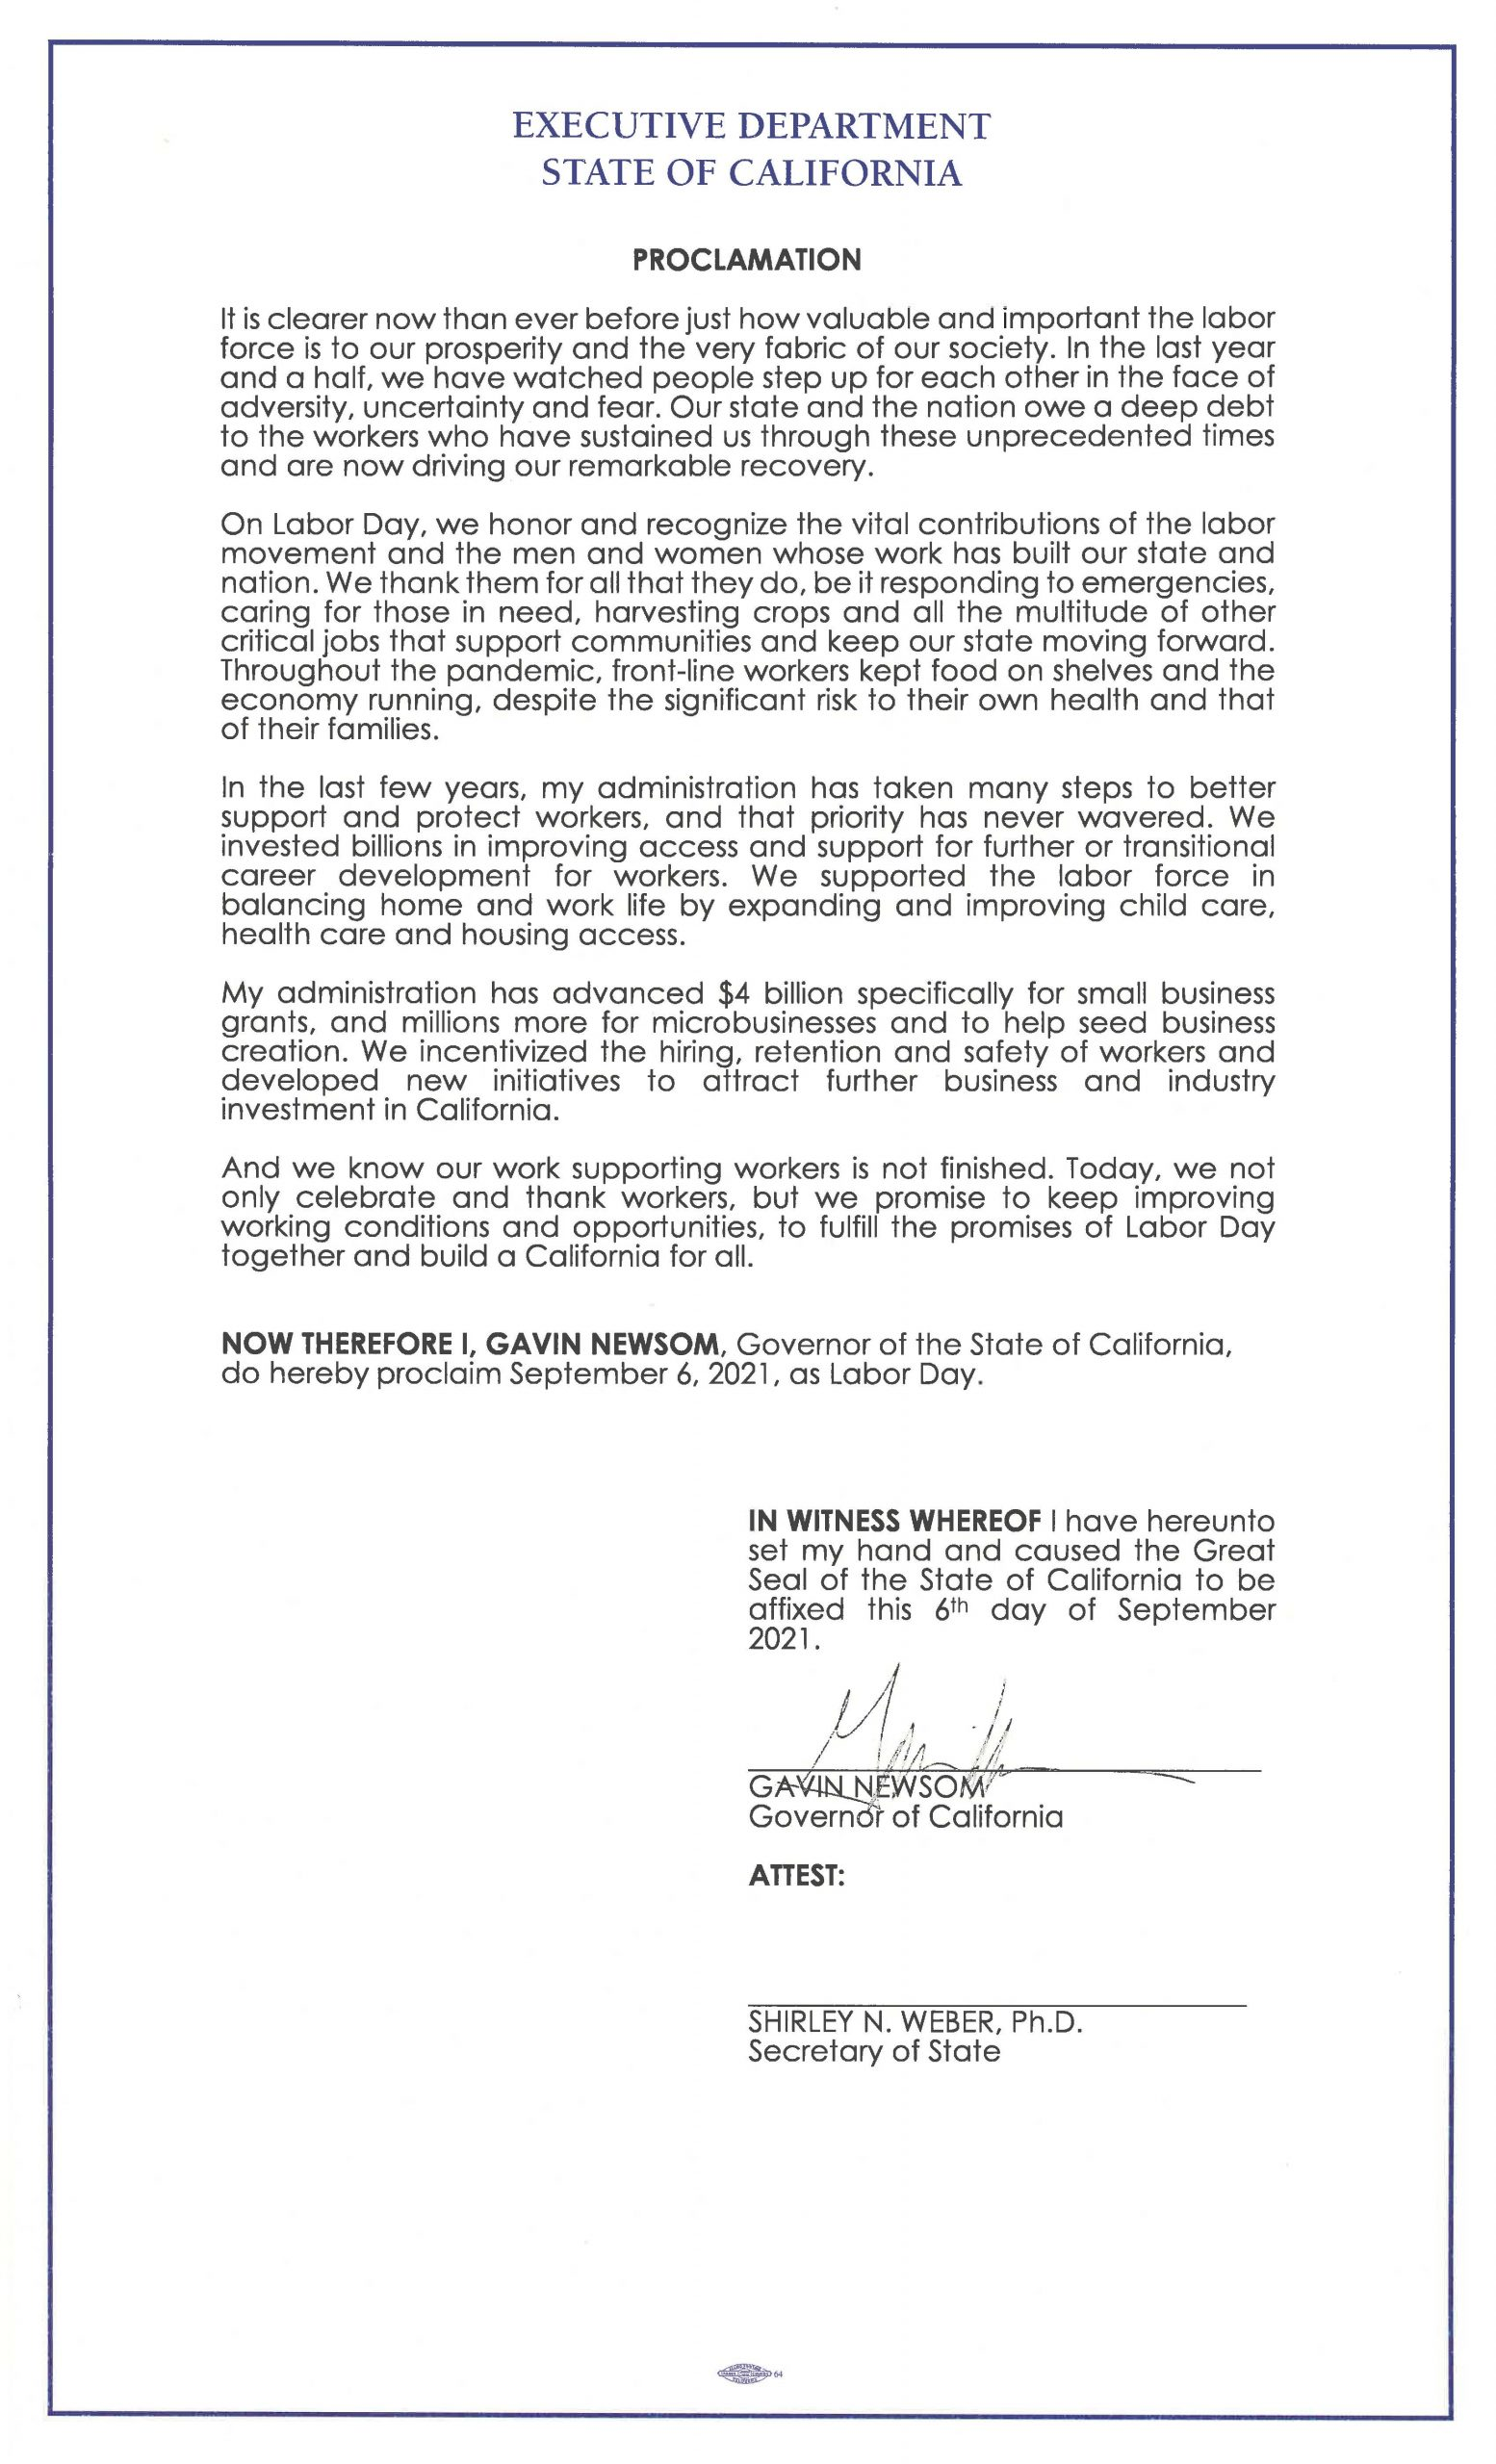 Labor Day proclamation